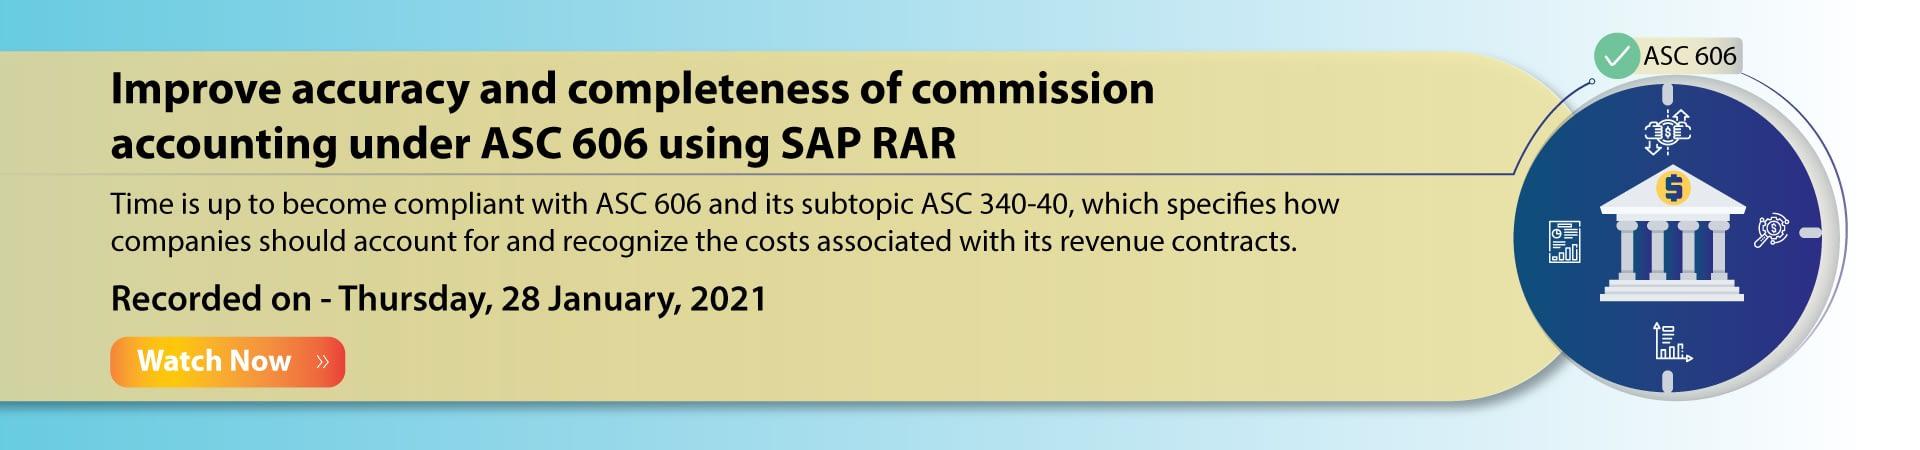 SAP RAR banner